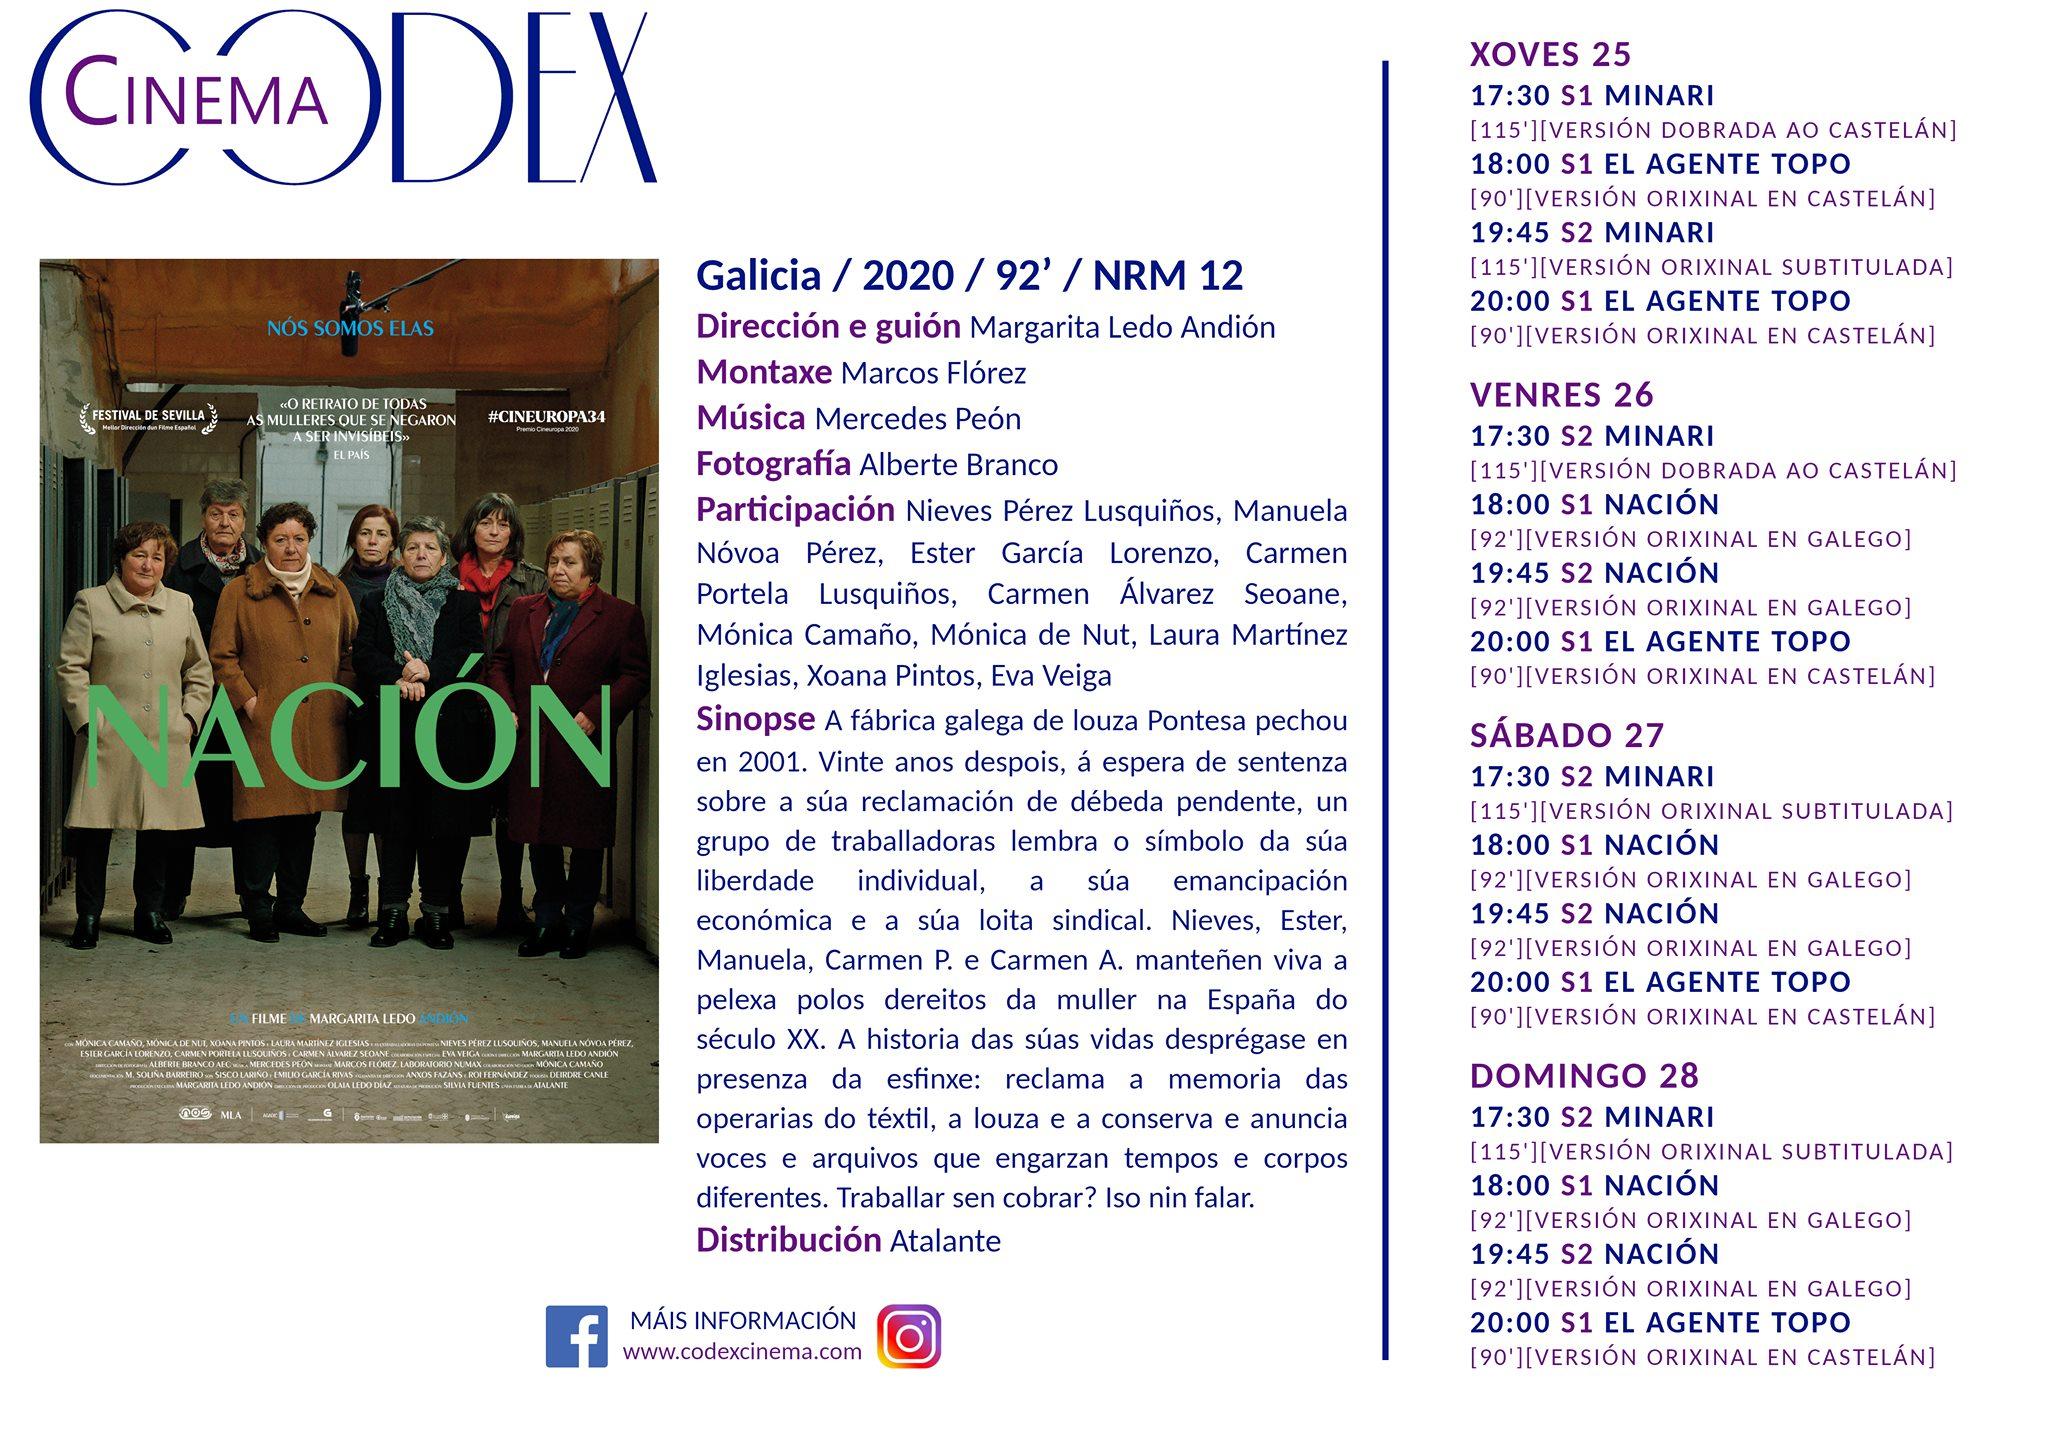 Carteleira do Códex Cinema Lugo a partir do xoves 25-03